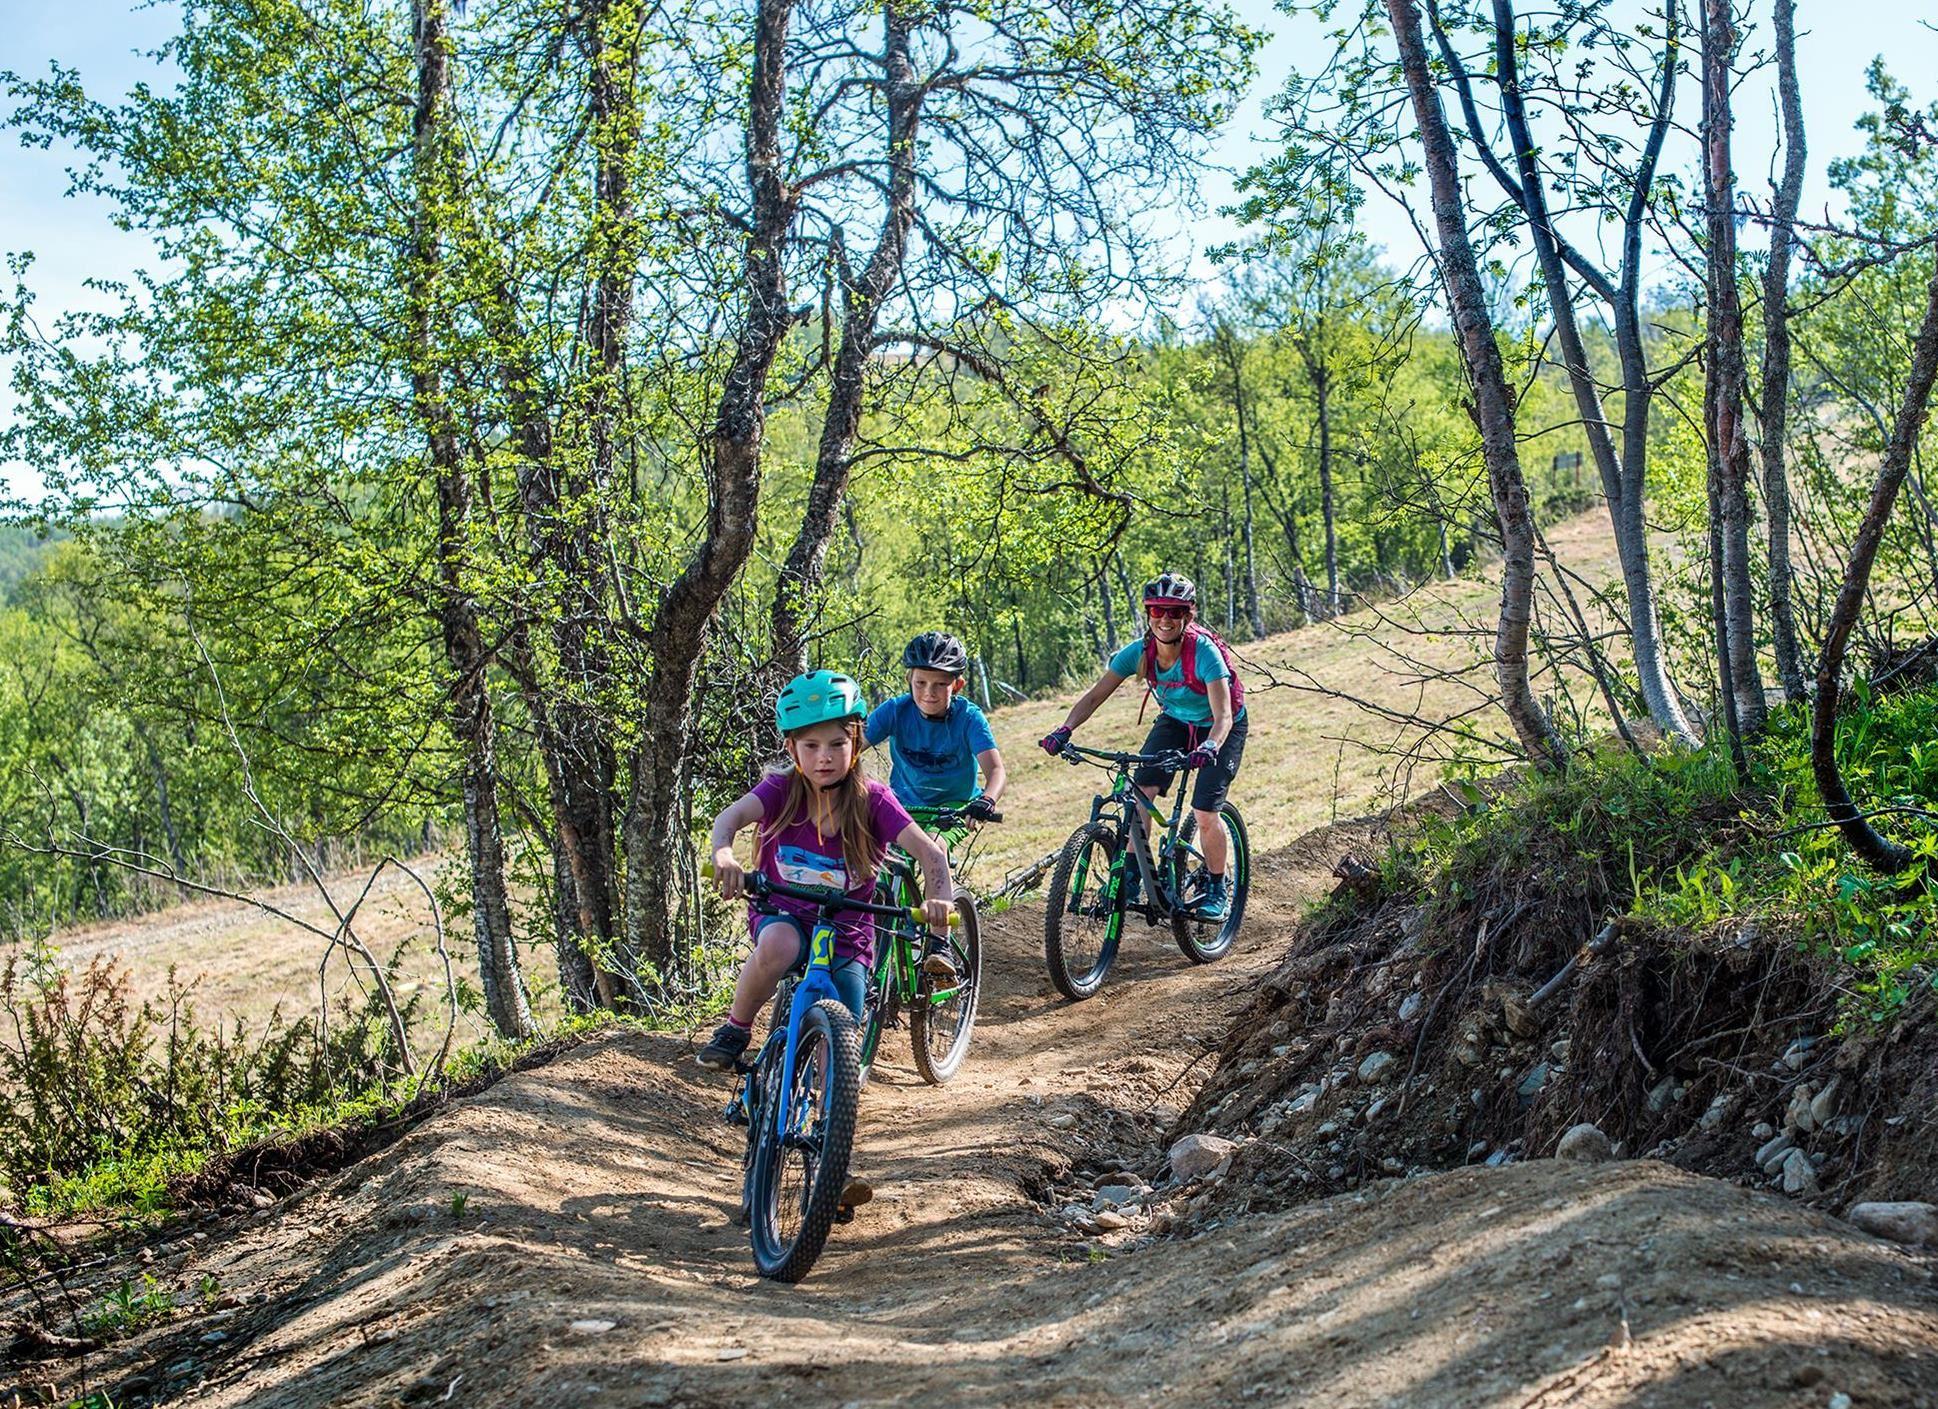 Rickard Bergstedt, Introduktion till flow trail i Ramundbergets cykelpark